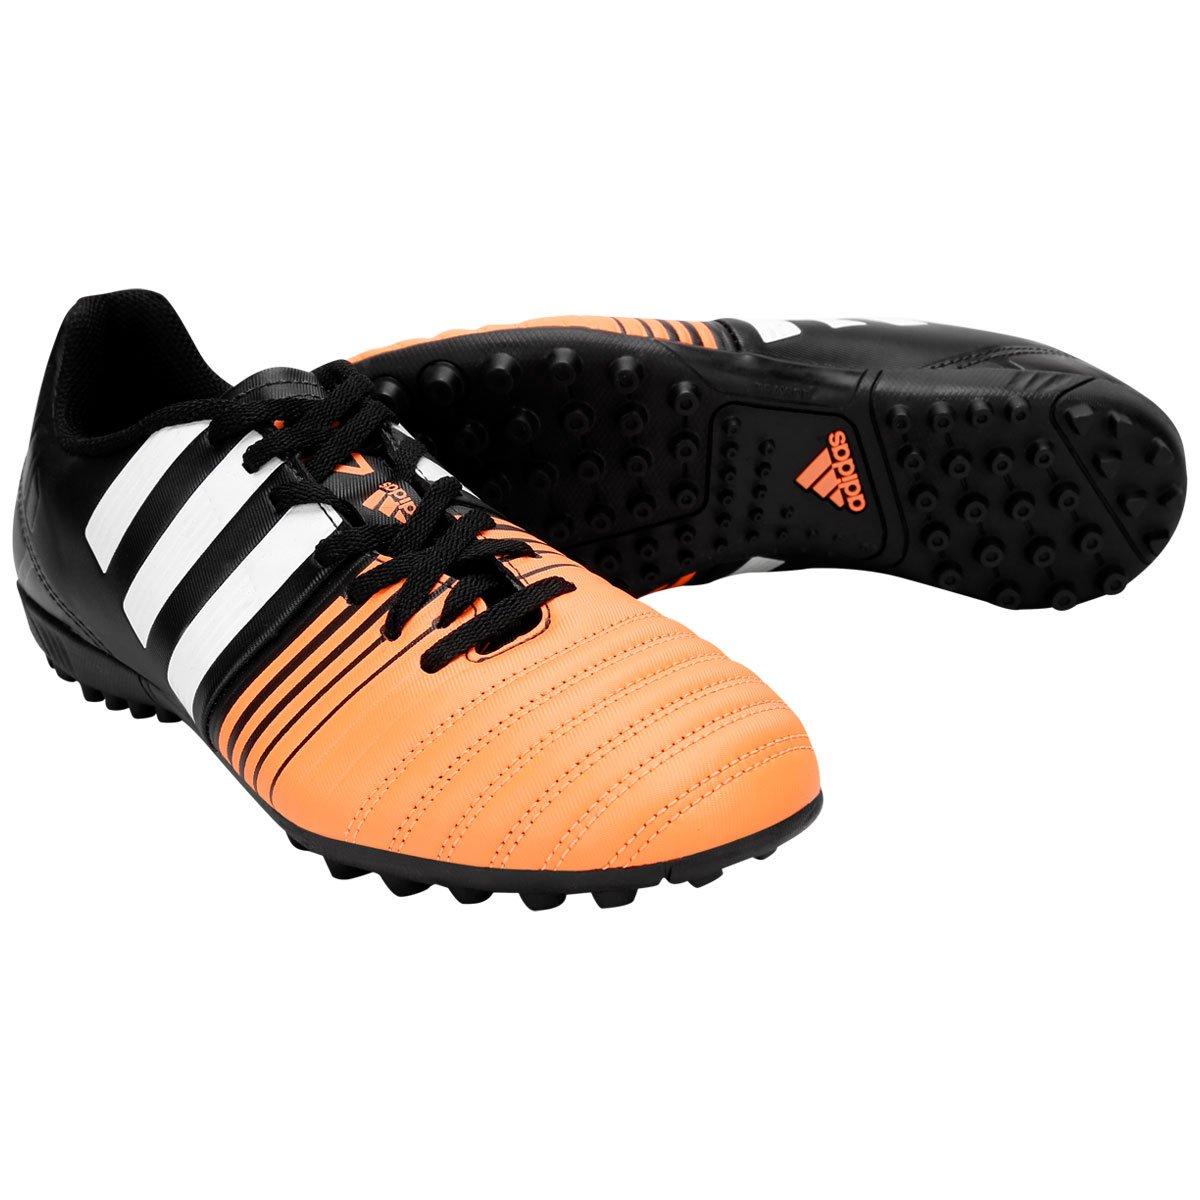 Chuteira Adidas Nitrocharge 4.0 TF Society - Compre Agora  ec3beebdf21ad